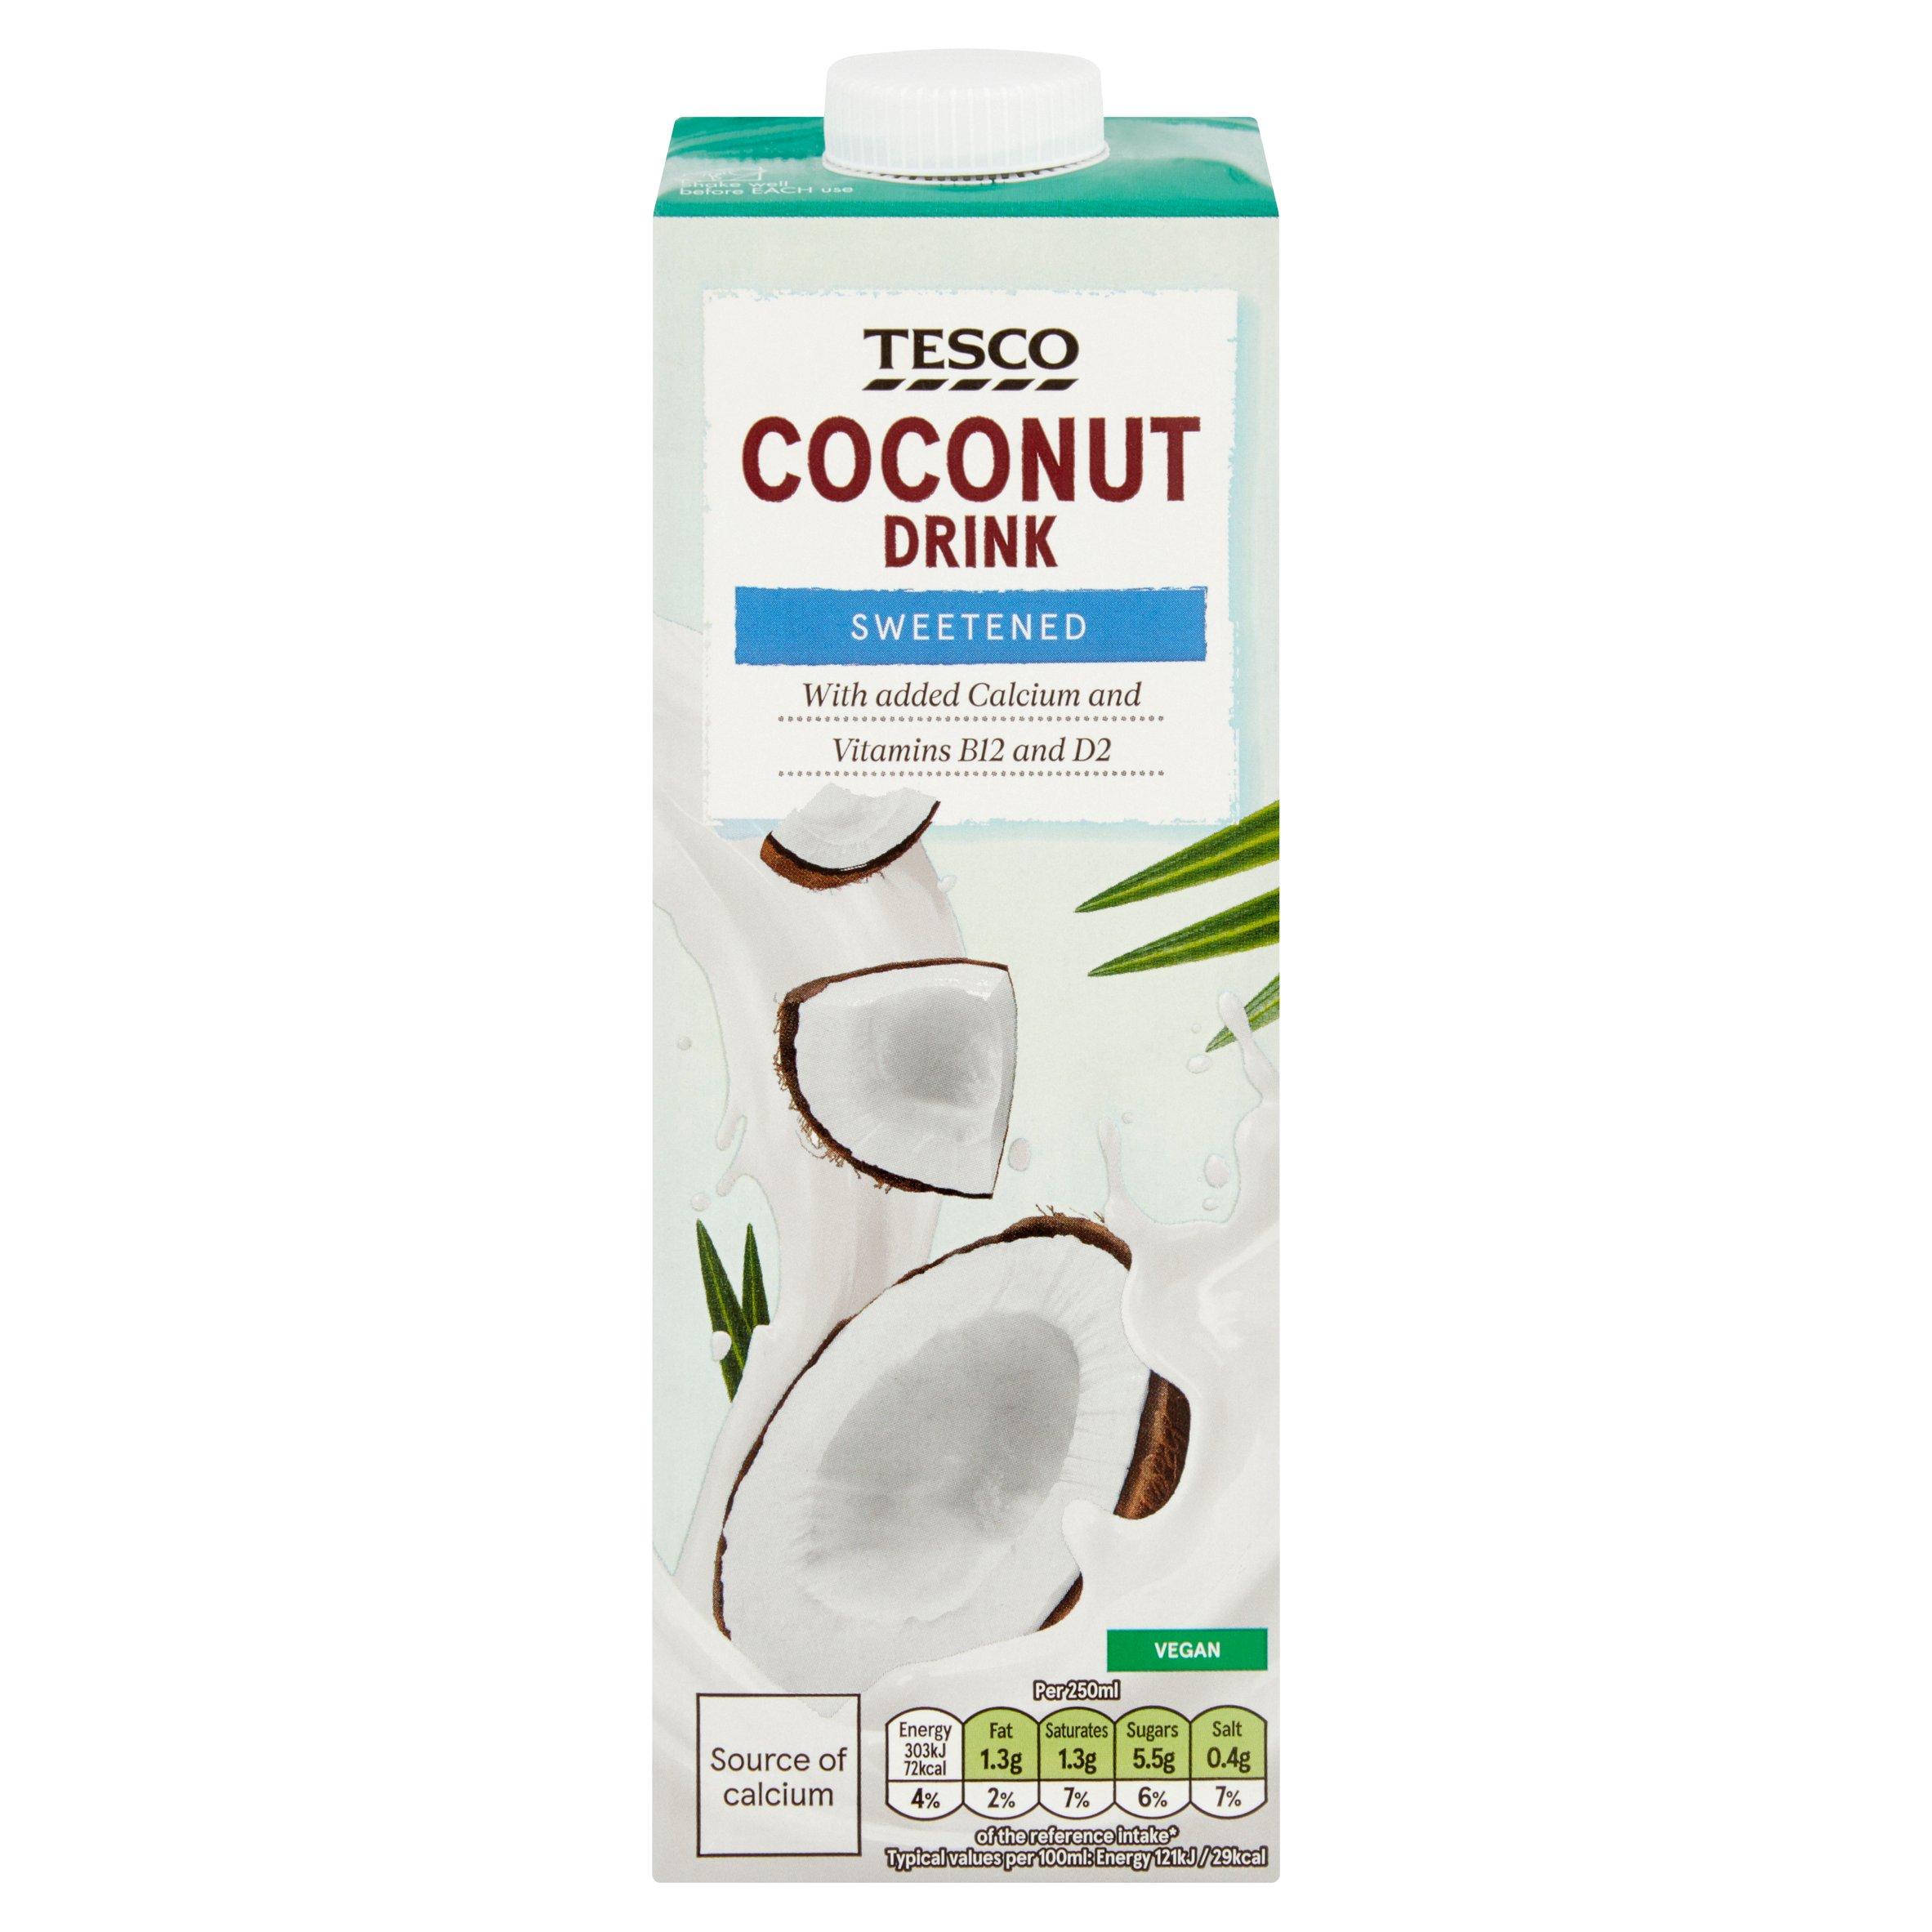 Tesco Coconut Drink 1 Litre